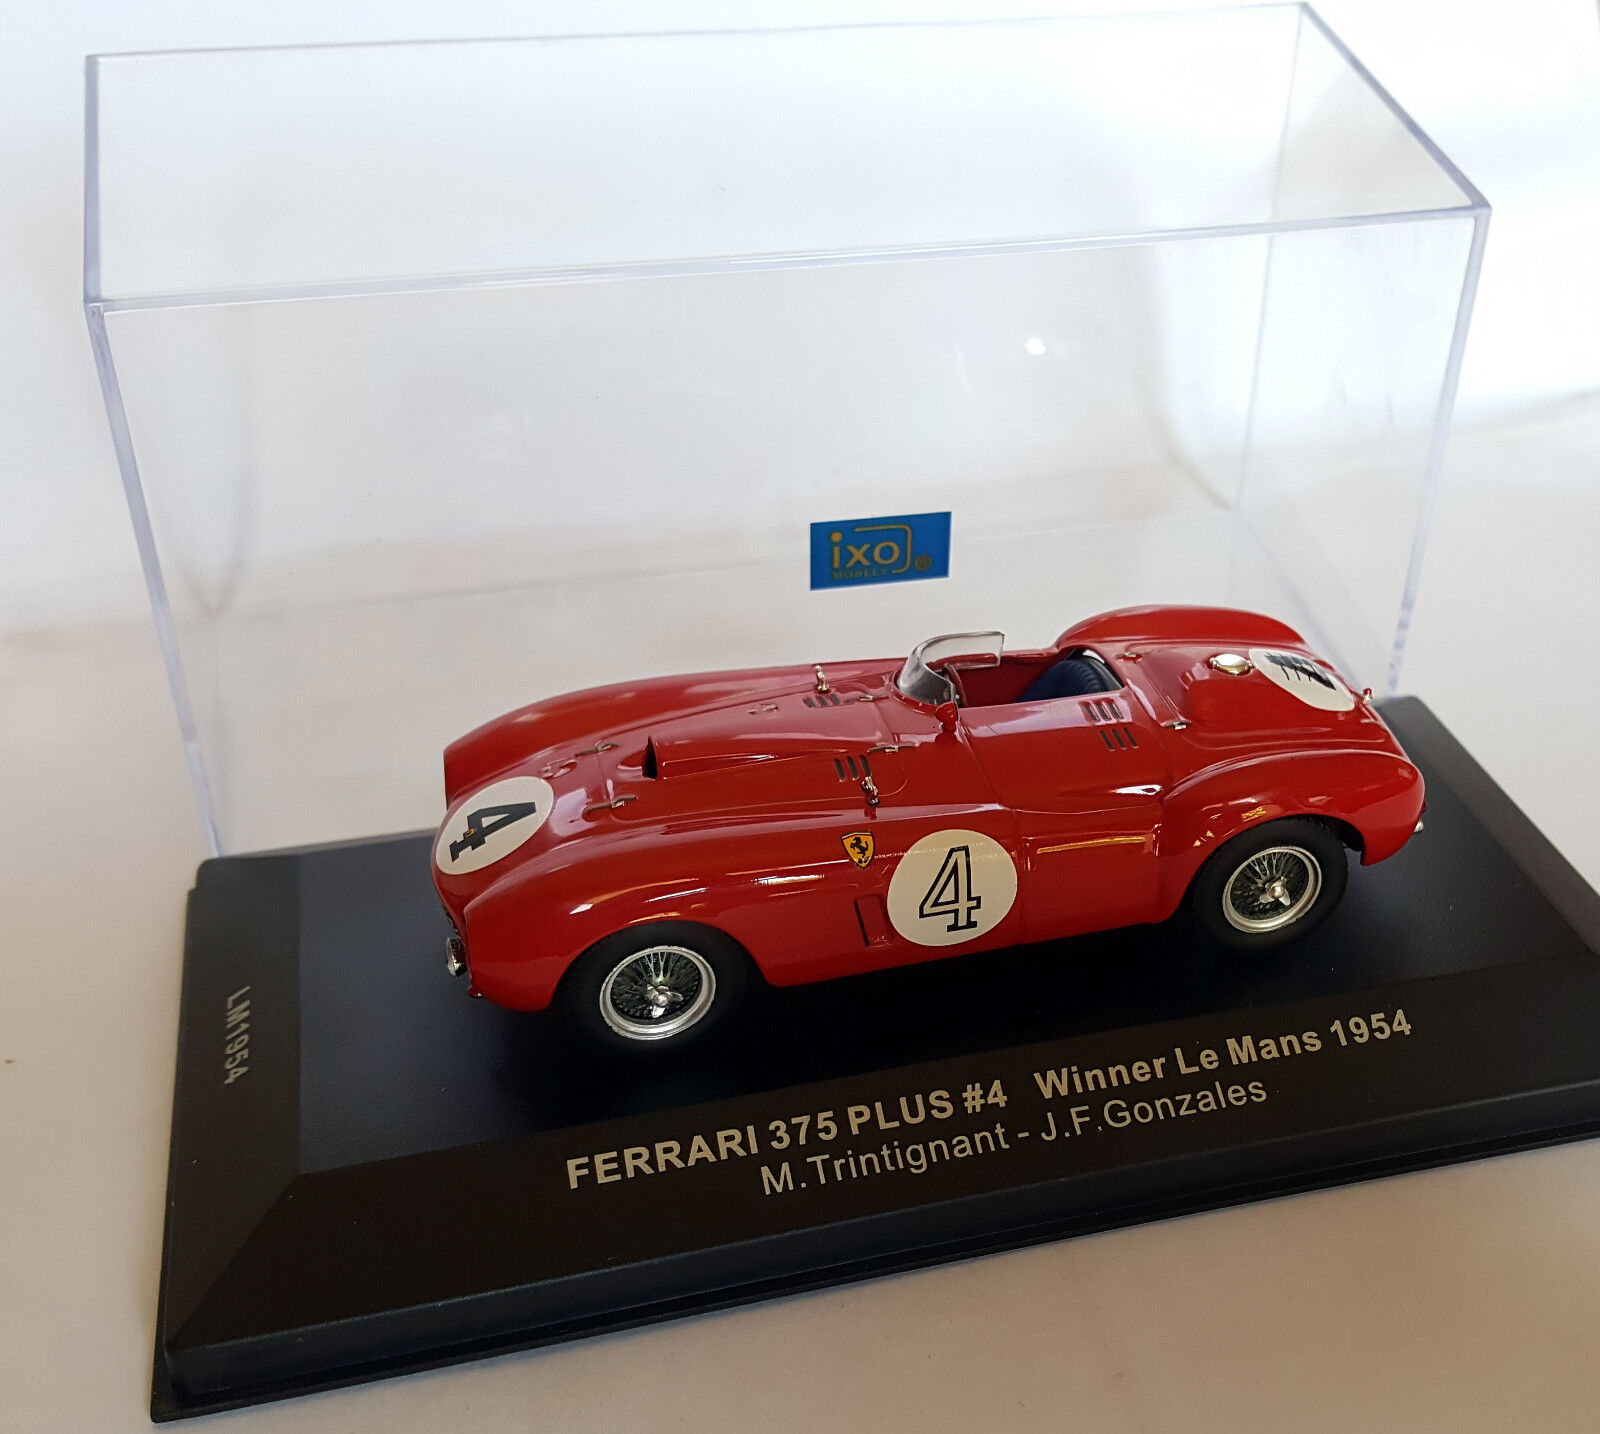 FERRARI 375 Plus   4 Winner Le Mans 1954-TRINTIGNANT / Gonzales IXO 1/43